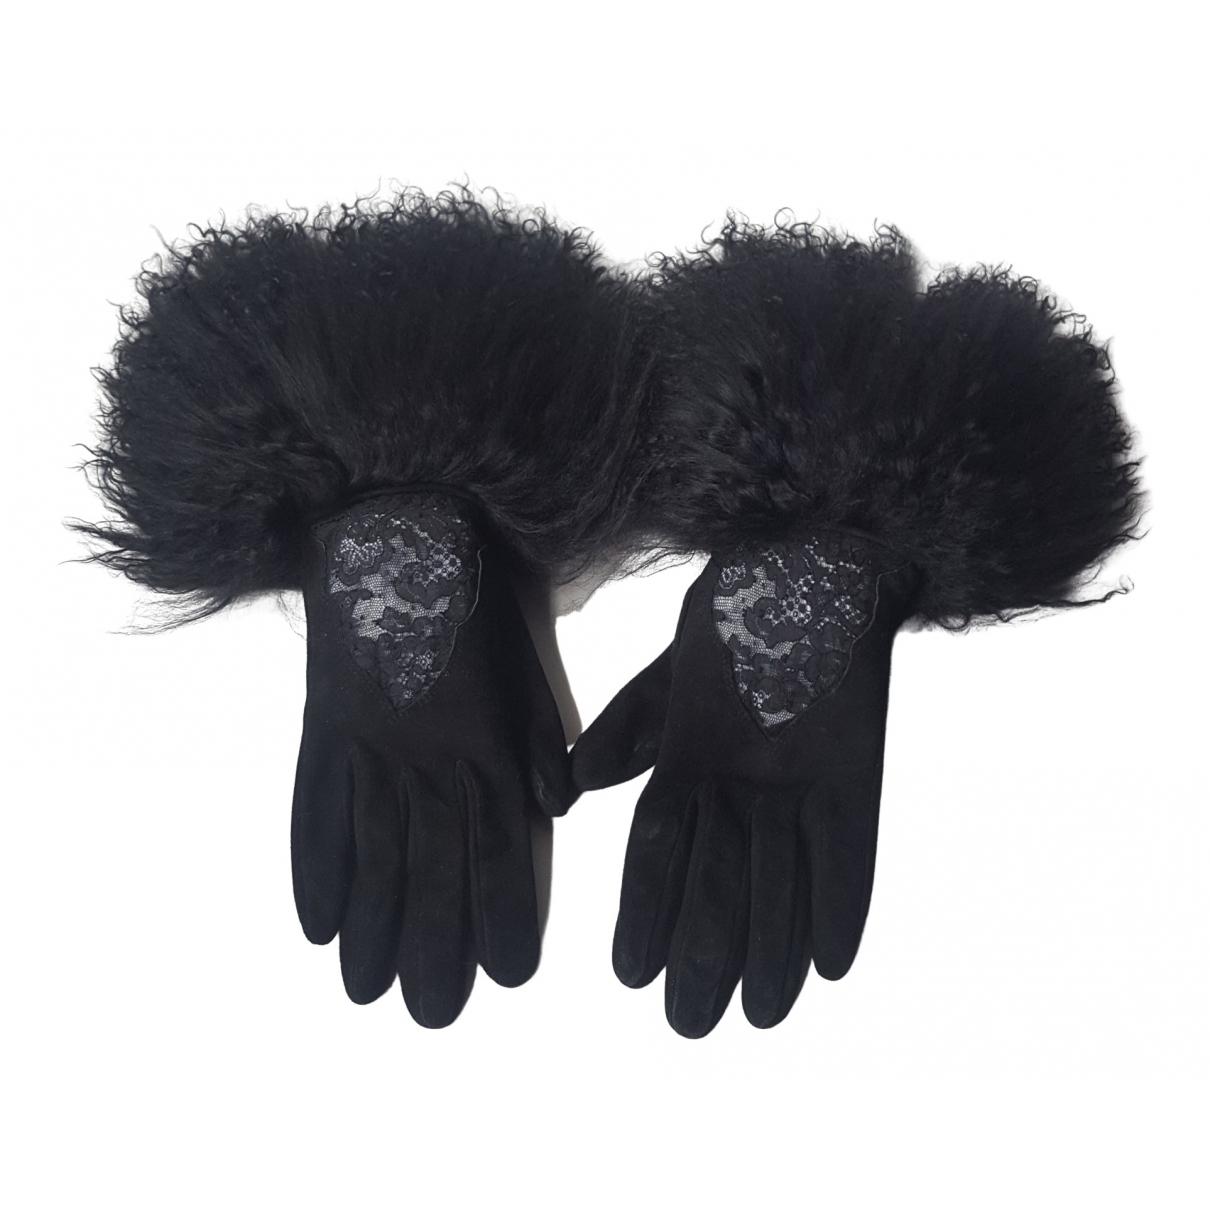 Dior \N Black Leather Gloves for Women S International